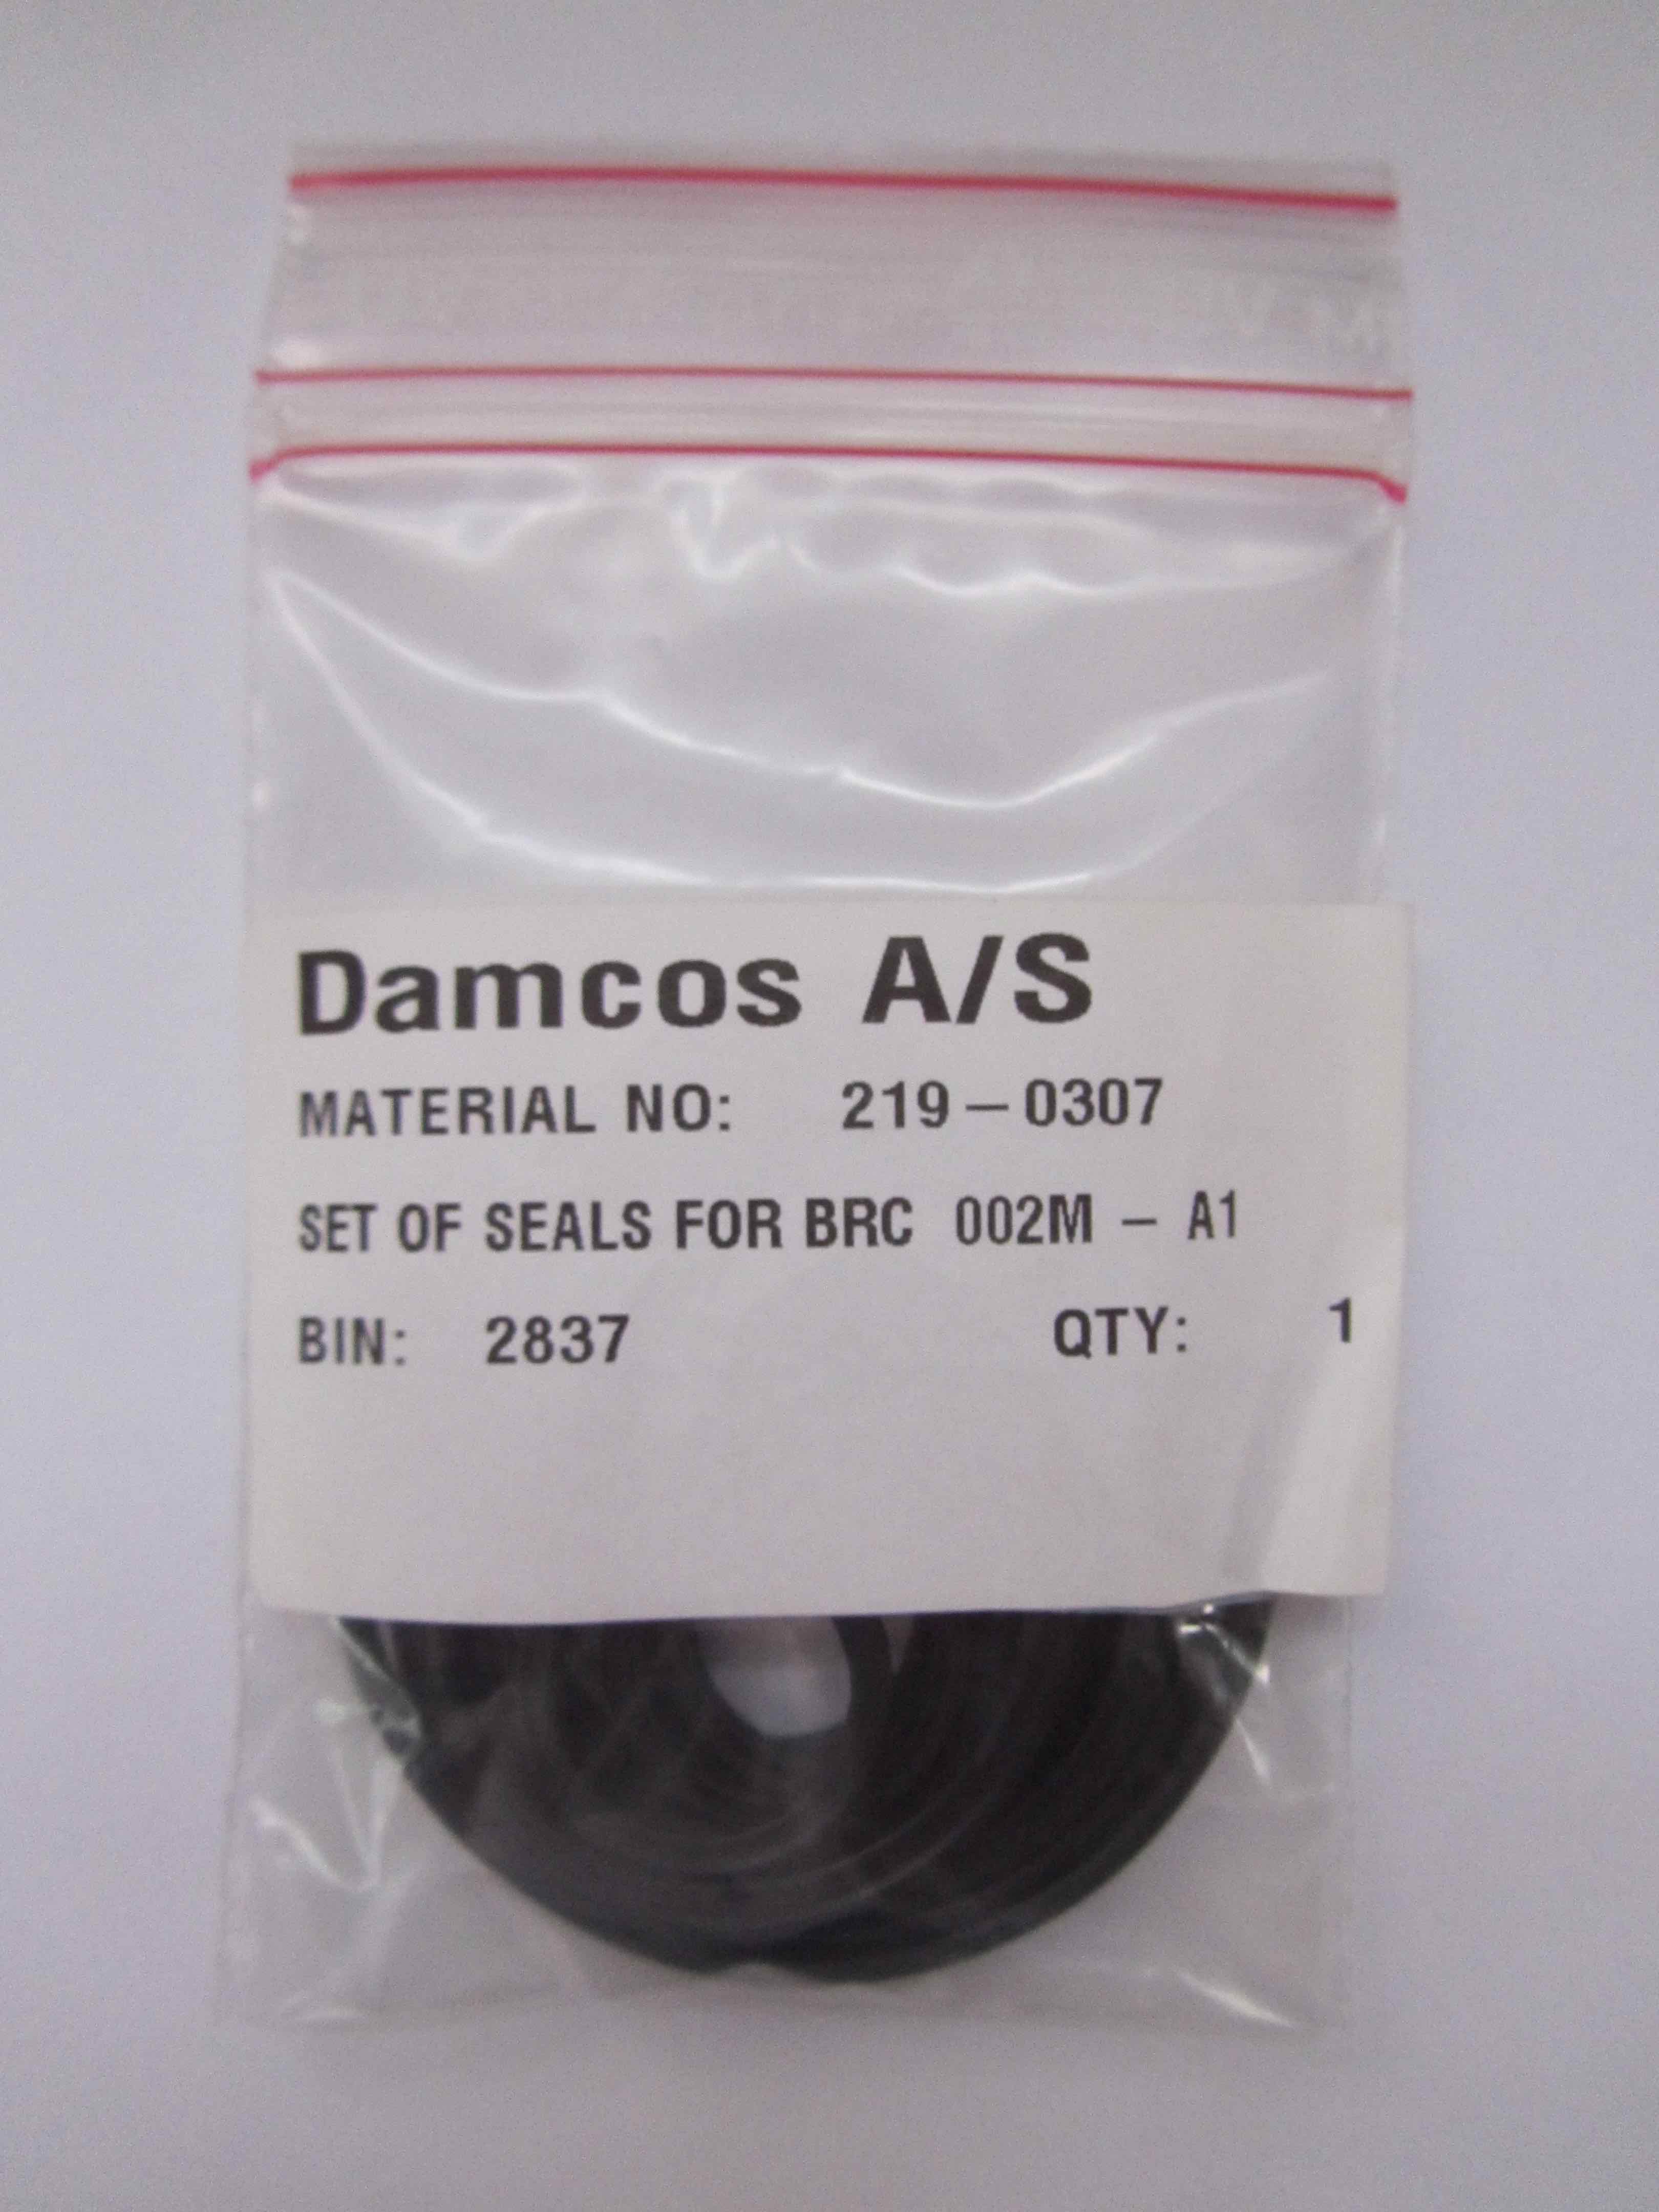 Damcos : Danfoss BRC 002M 219-0307 Seal Kit